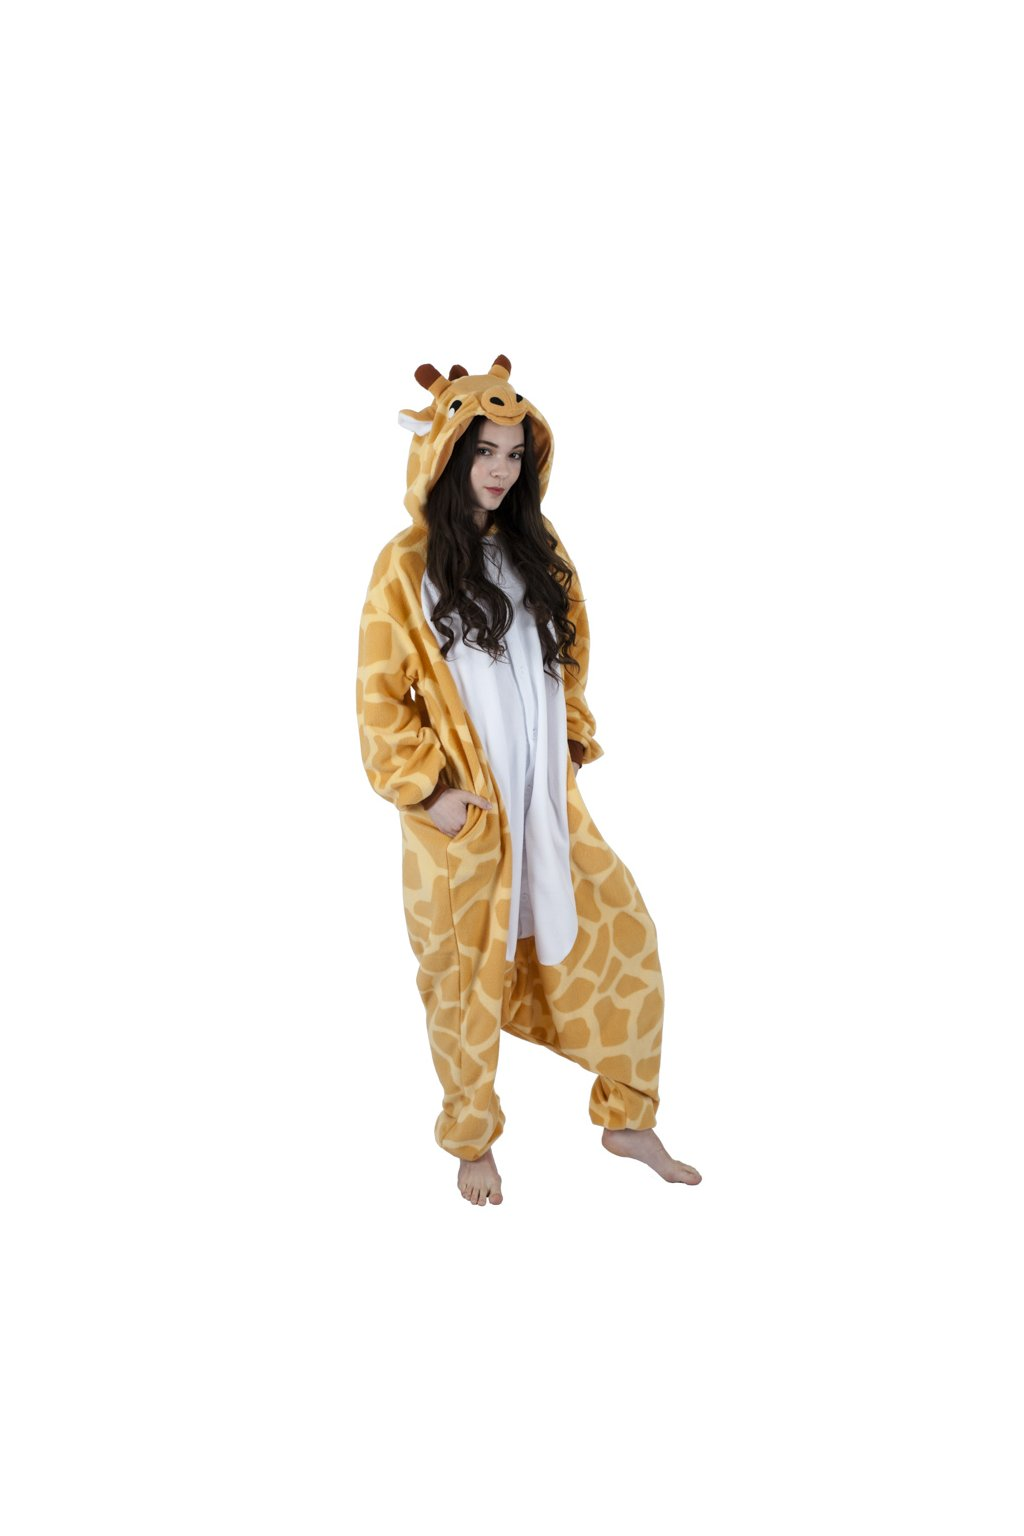 žirafa overal kigu (2)